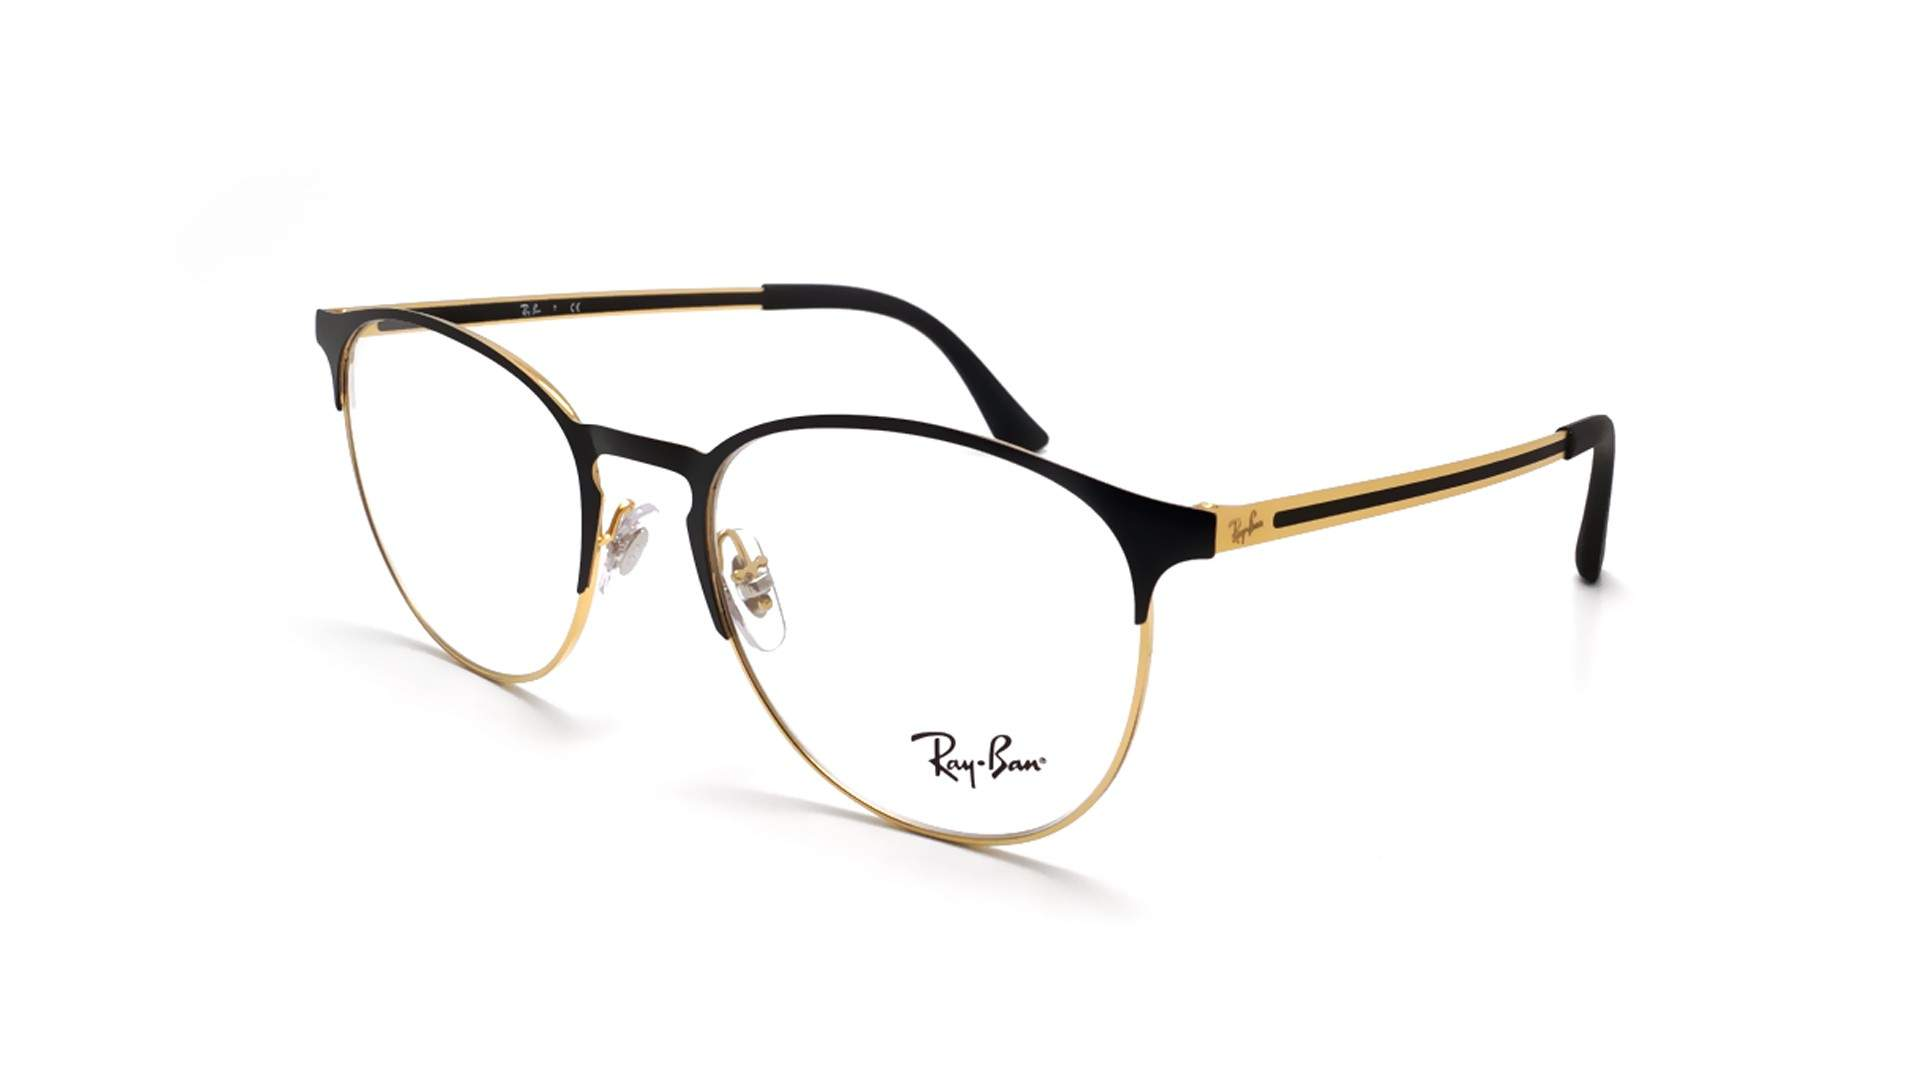 4a887174dc8 Eyeglasses Ray-Ban RX6375 RB6375 2890 53-18 Black Medium